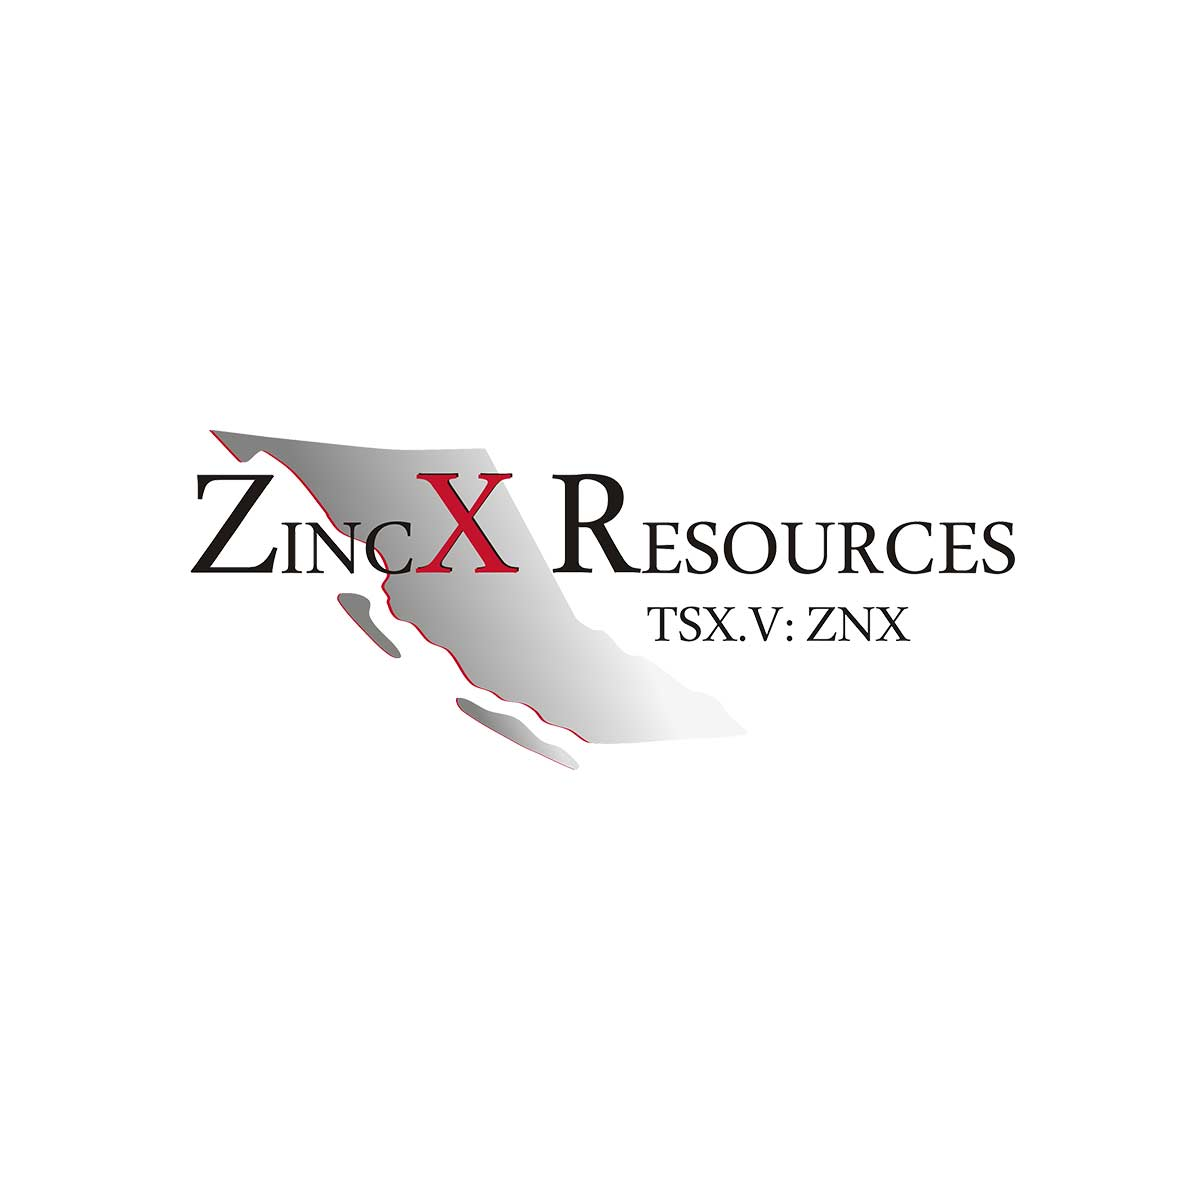 ZincX Resources Corp